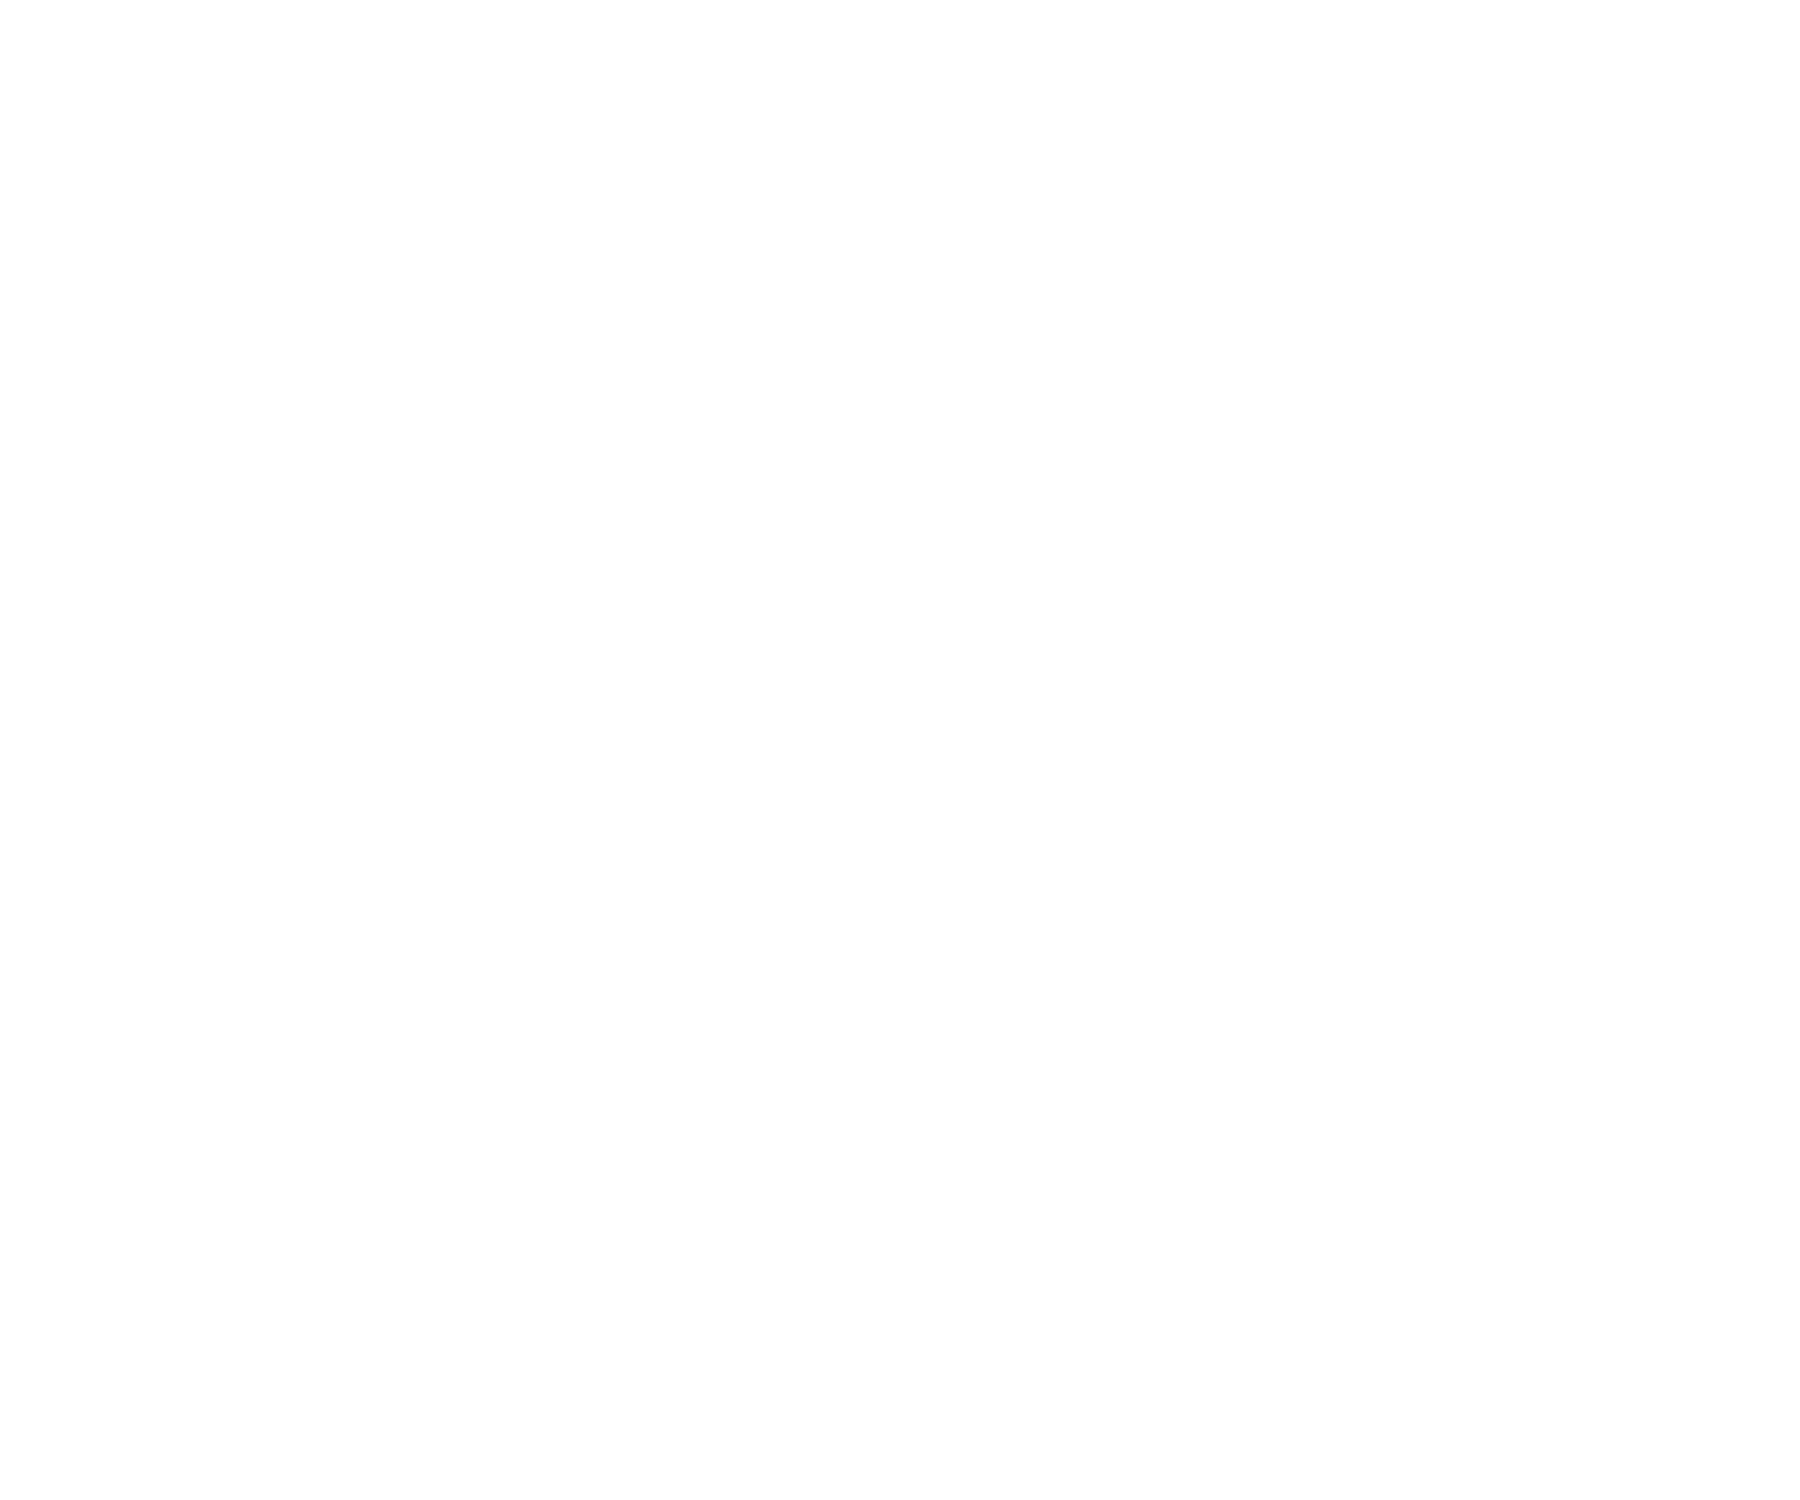 Large Logo For Your Mobile Mechanics Service Amersham